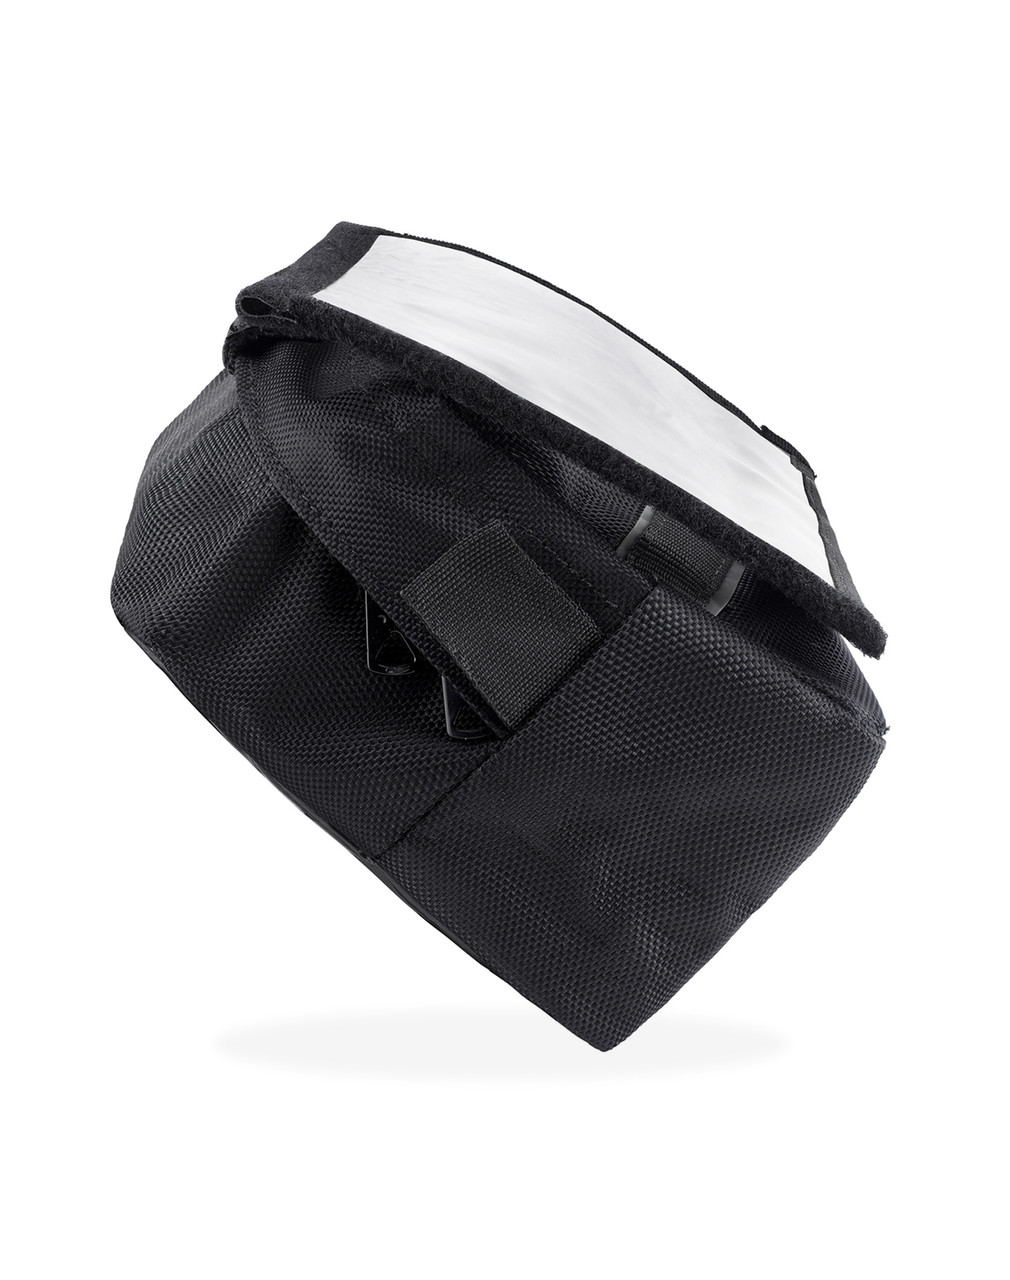 Viking Small Black Dirt Bike/Enduro Handleber Bag Rain Cover